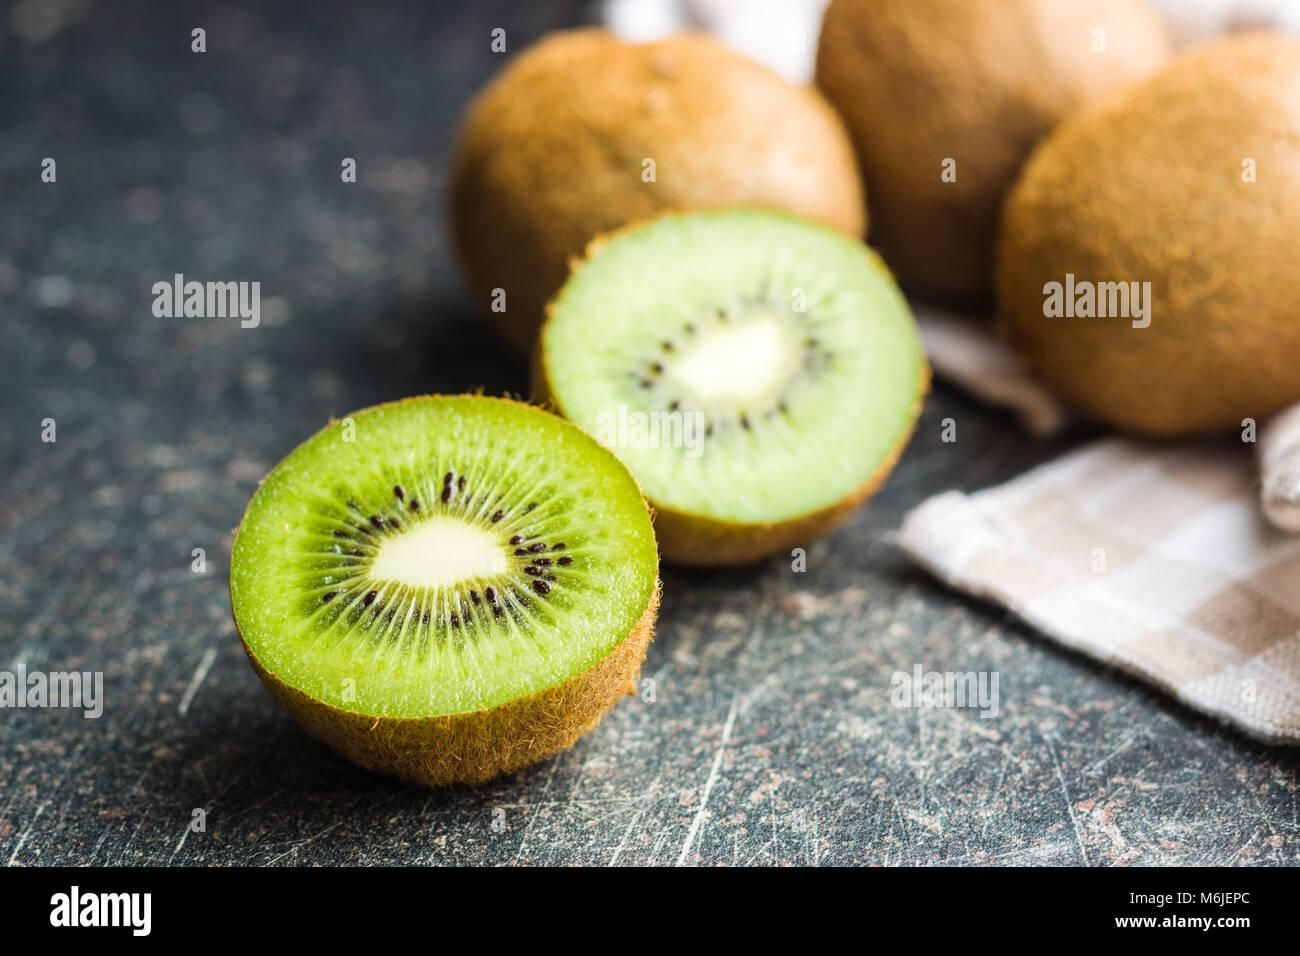 Halved kiwi fruit on old kitchen table. - Stock Image